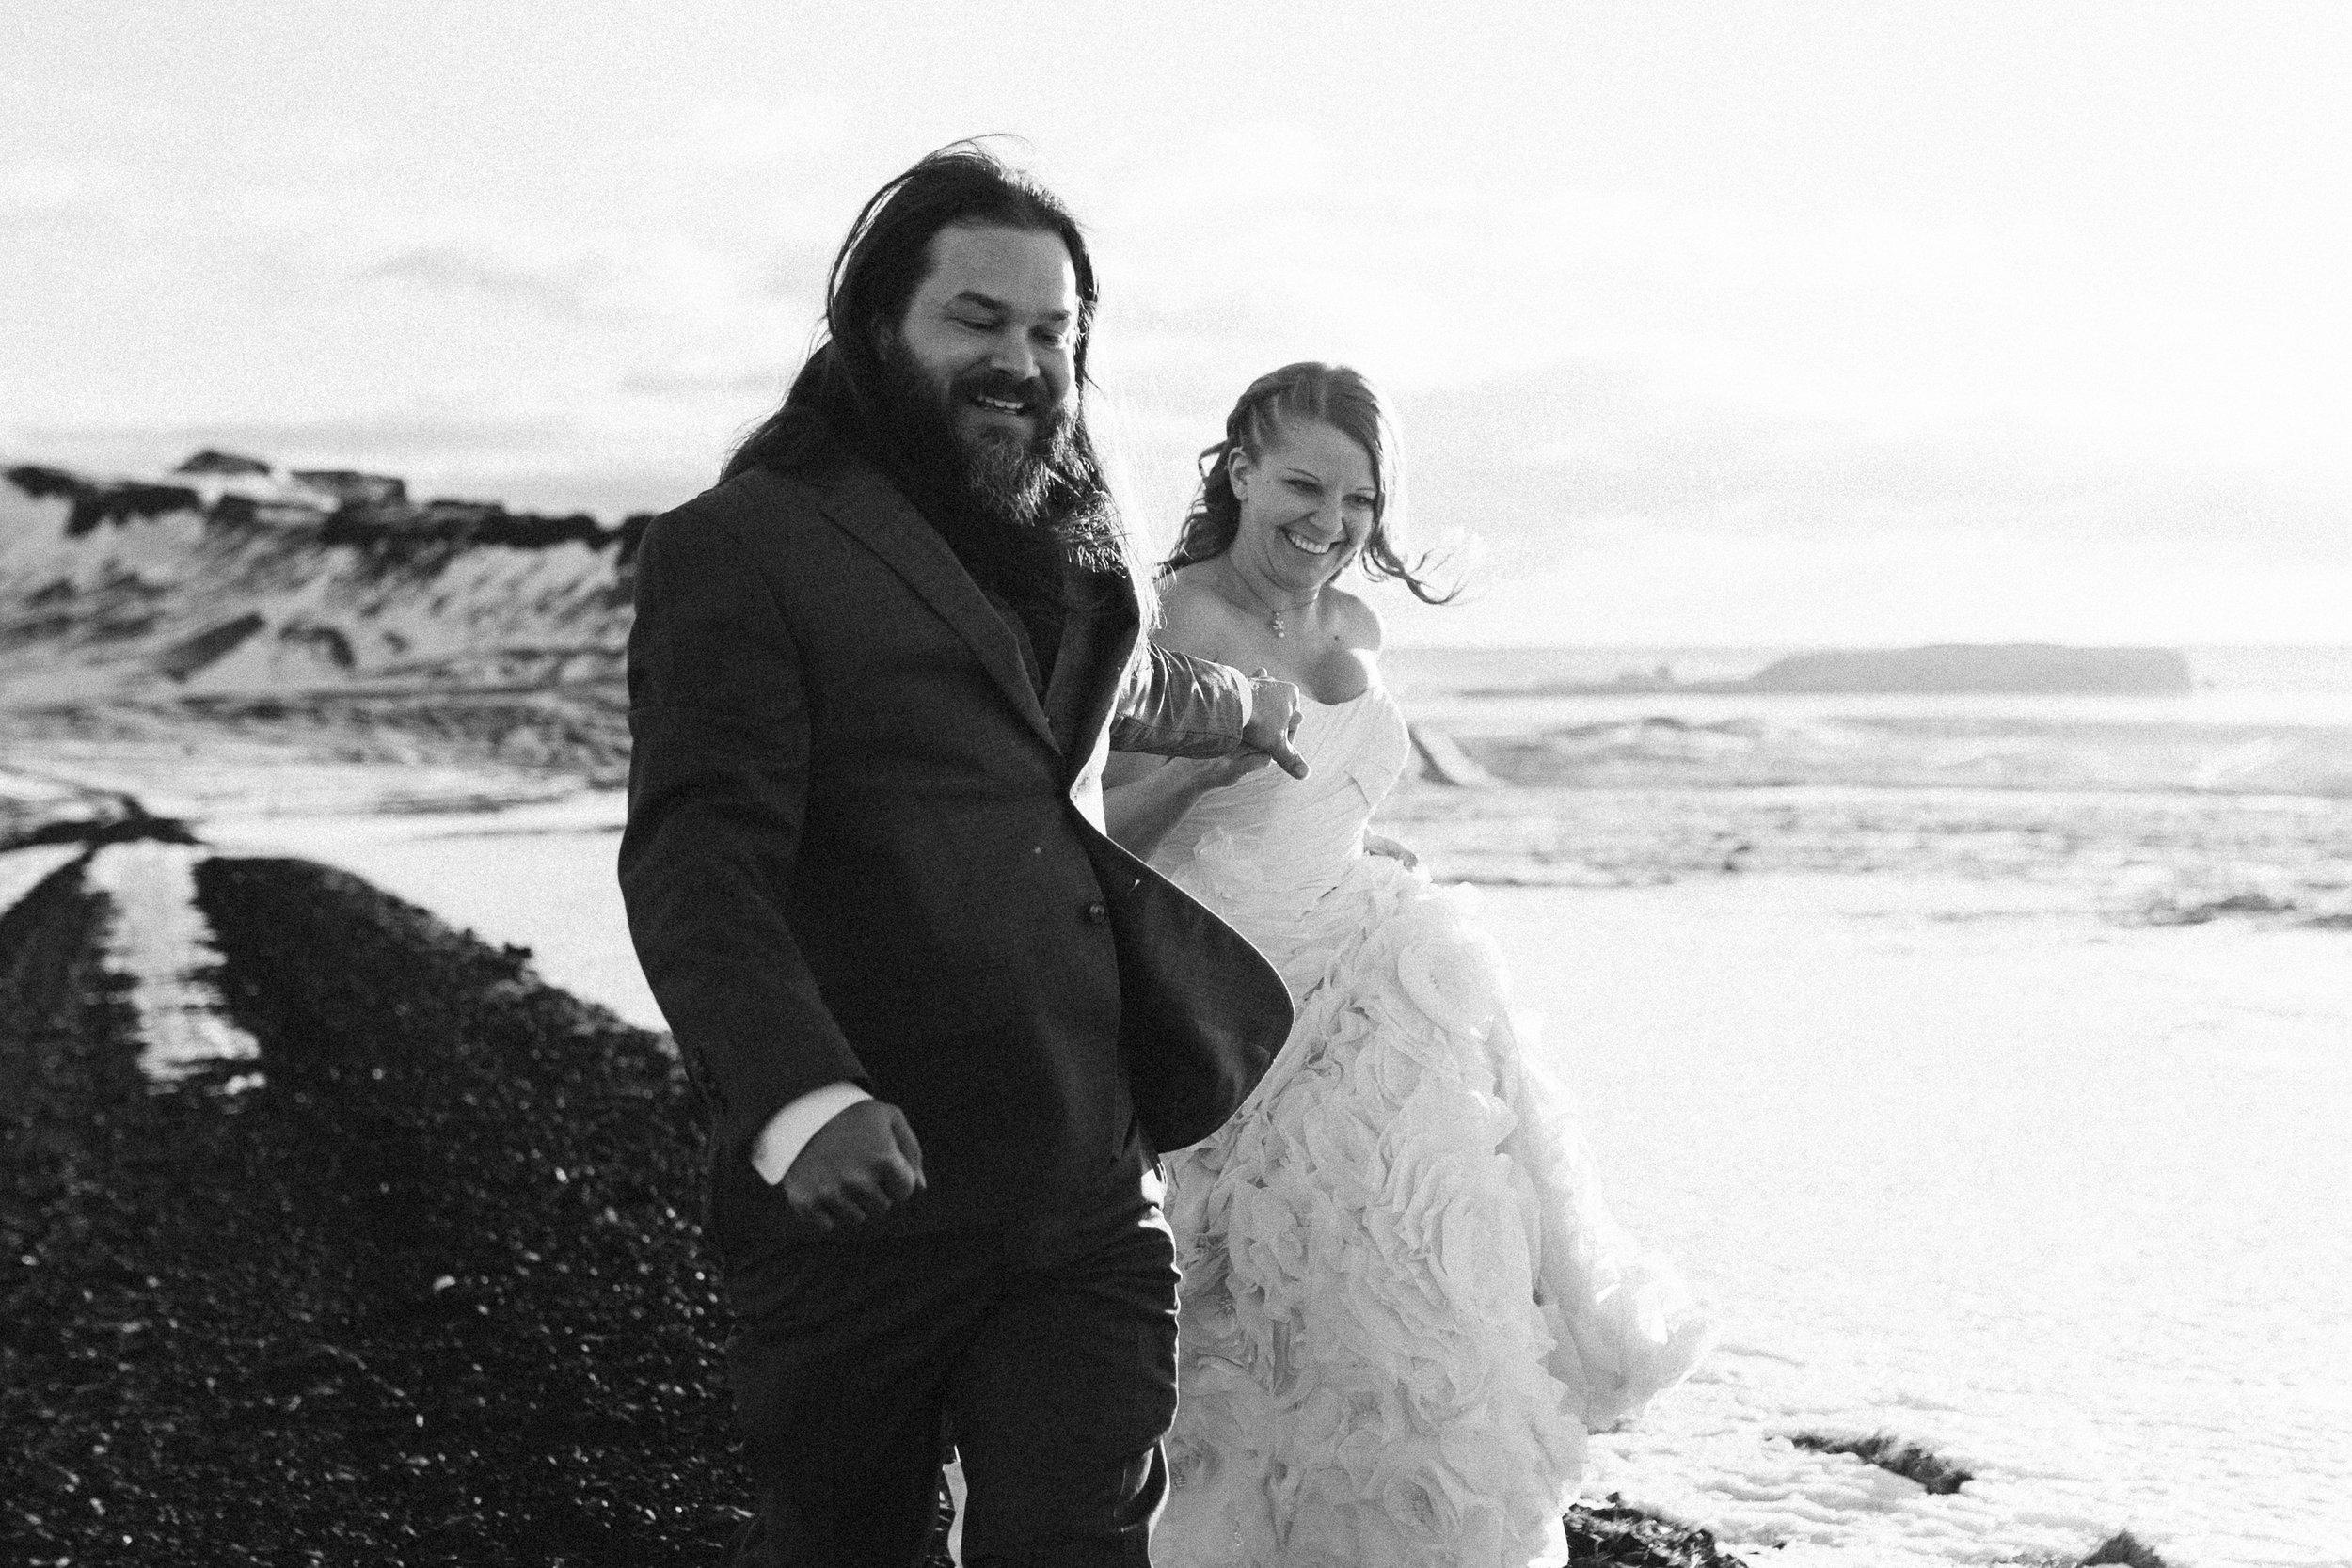 nicole-daacke-photography-iceland-winter-sunset-adventure-elopement-skogafoss-waterfall-black-sand-beach-dyrholaey-vik-iceland-intimate-wedding-black-church-elopement-photographer-16.jpg